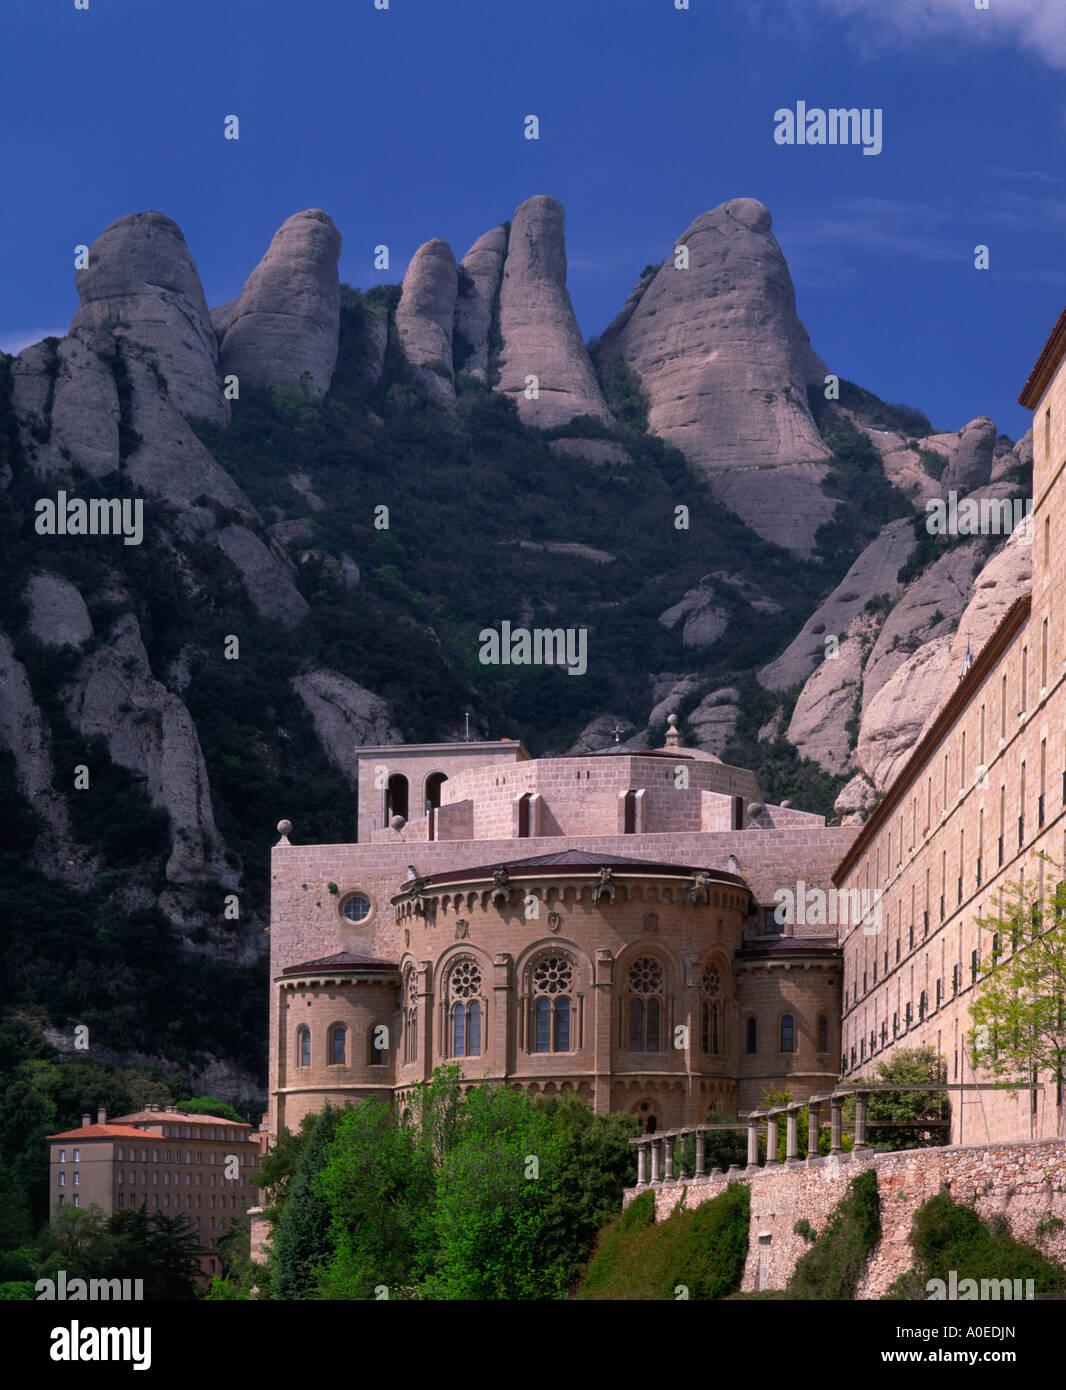 Monasterio de Montserrat Cataluña España Imagen De Stock